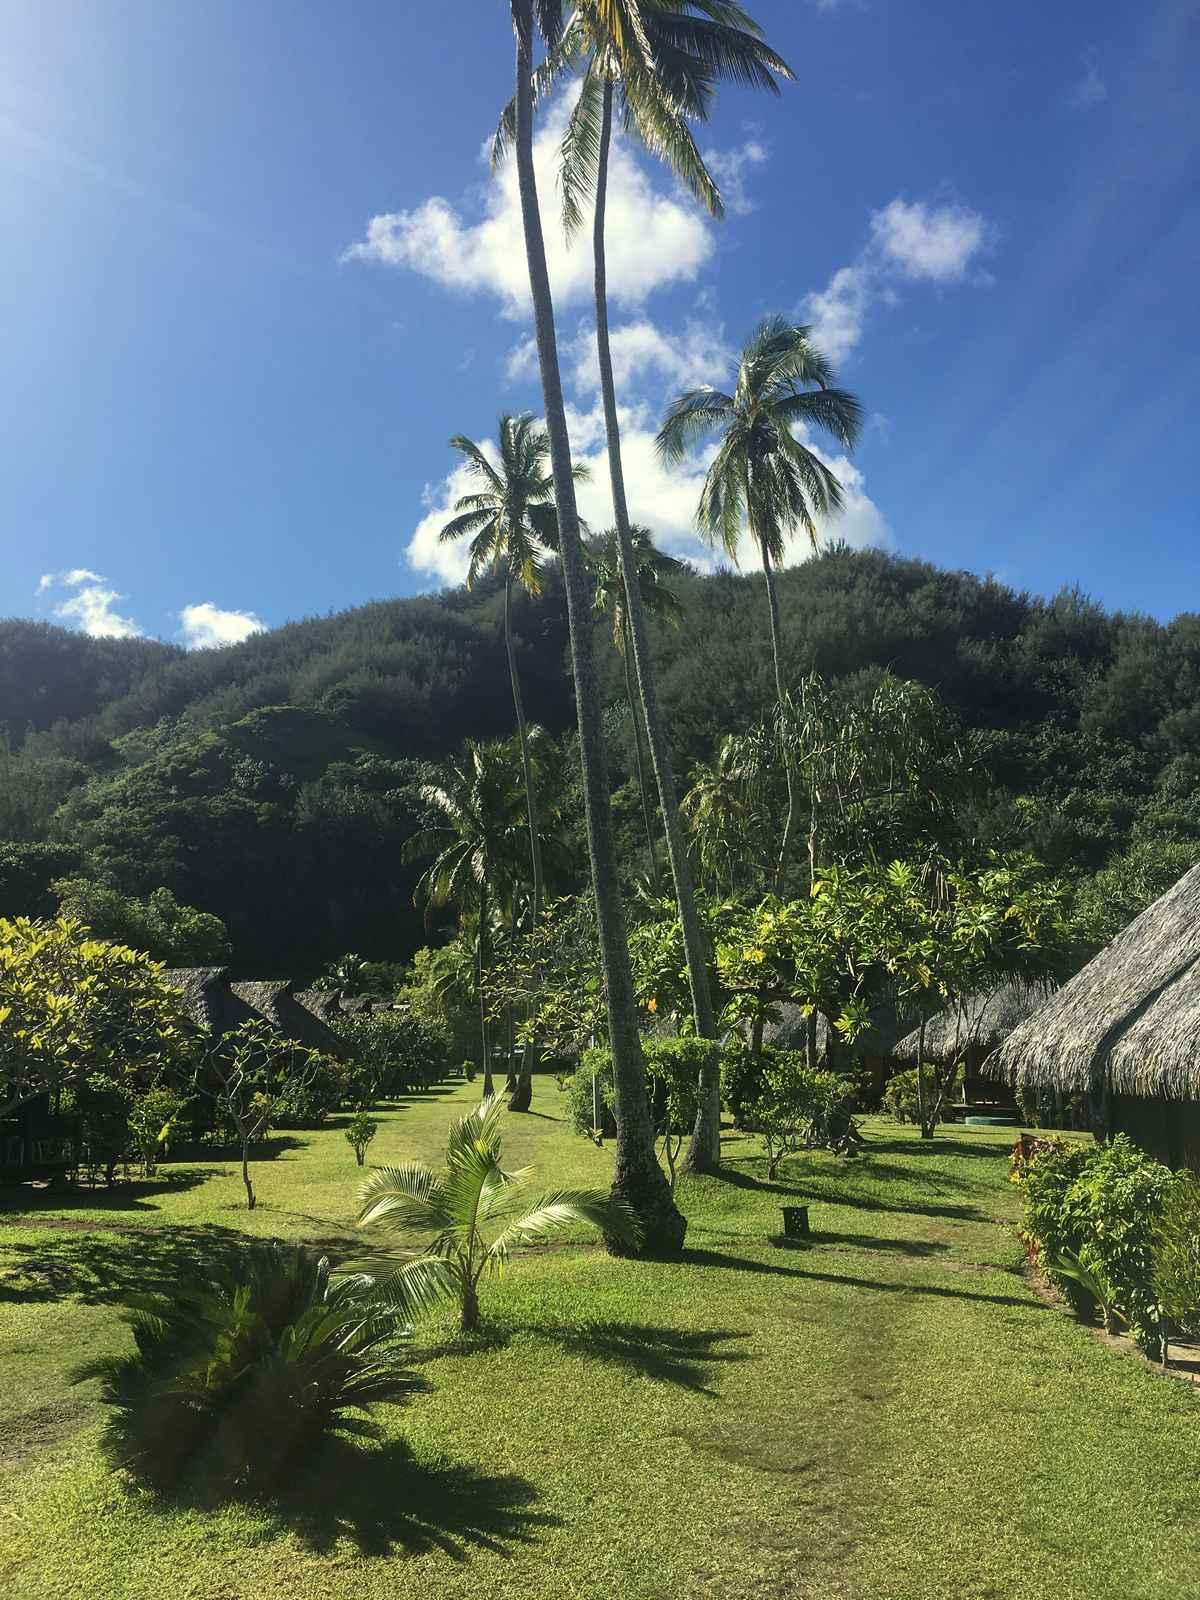 le jardin tropical de l'hotel hibiscus à Moorea